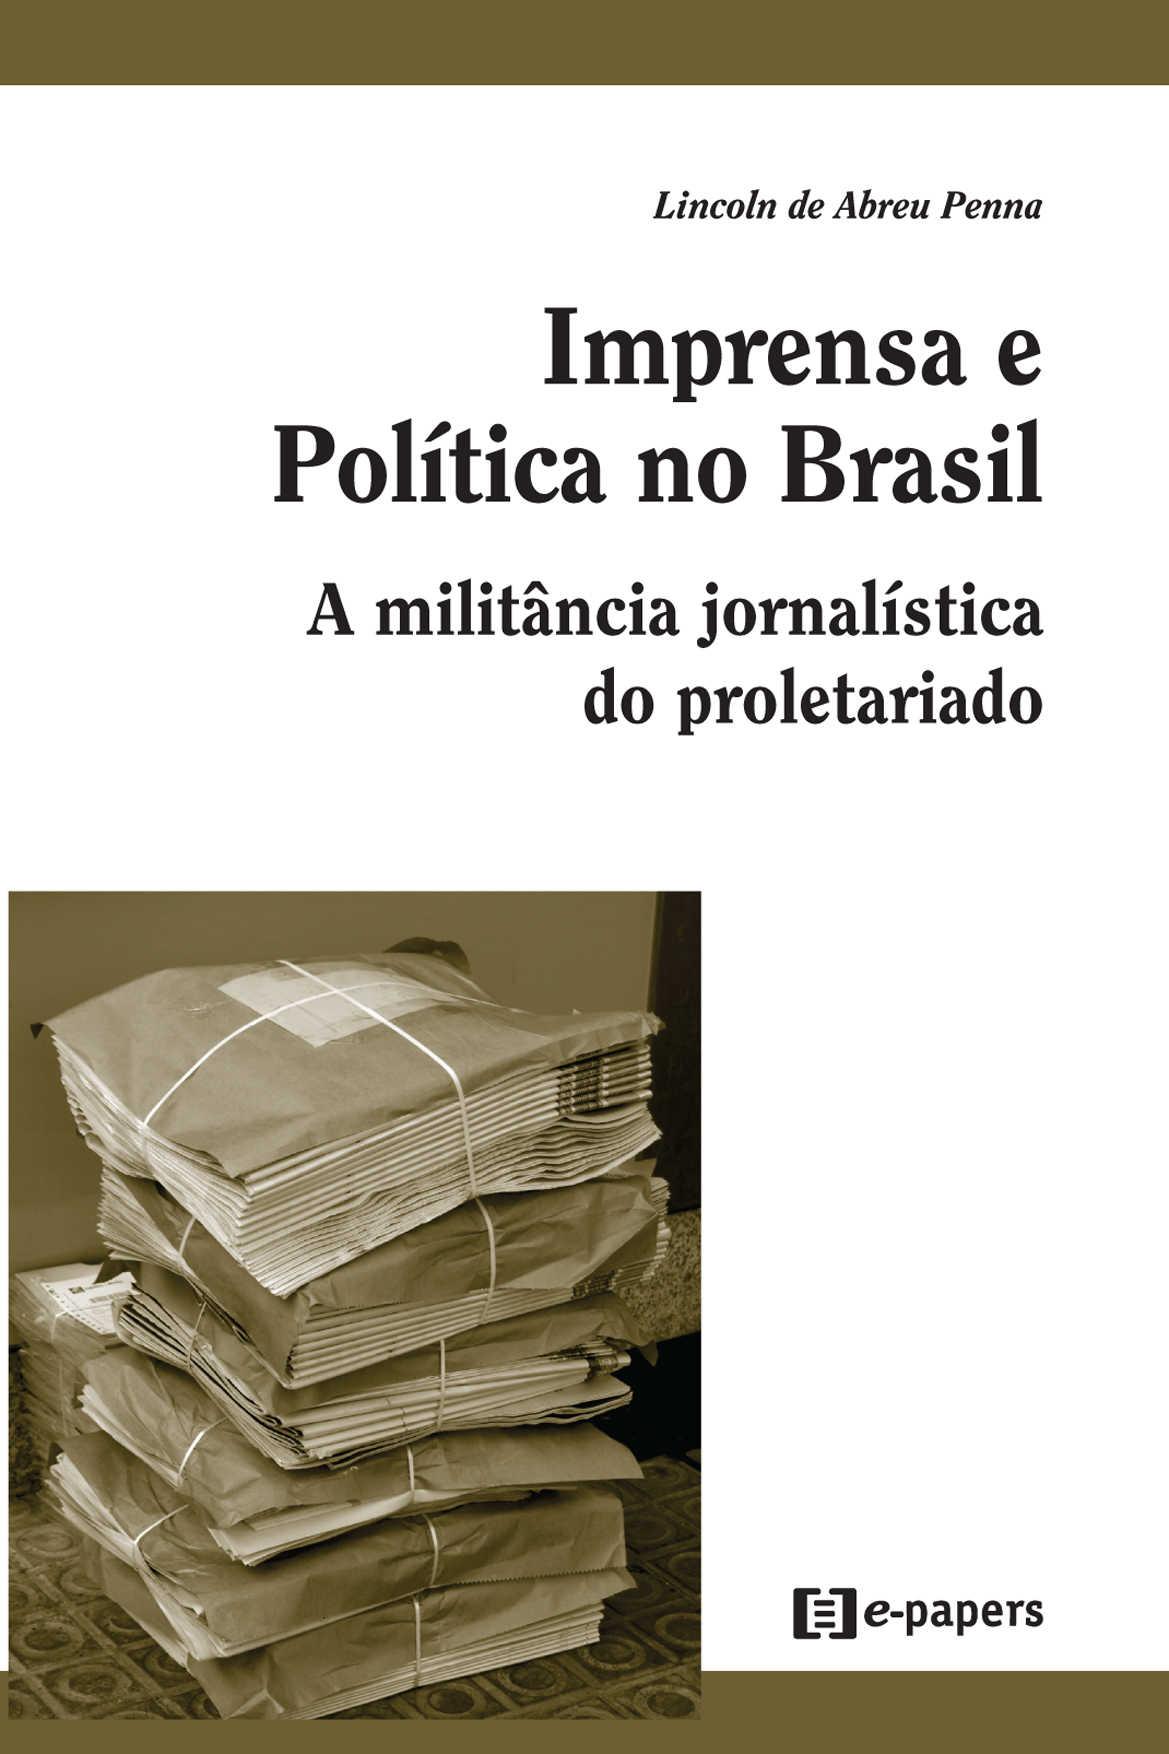 Imprensa e política no Brasil: A militância jornalística do proletariado